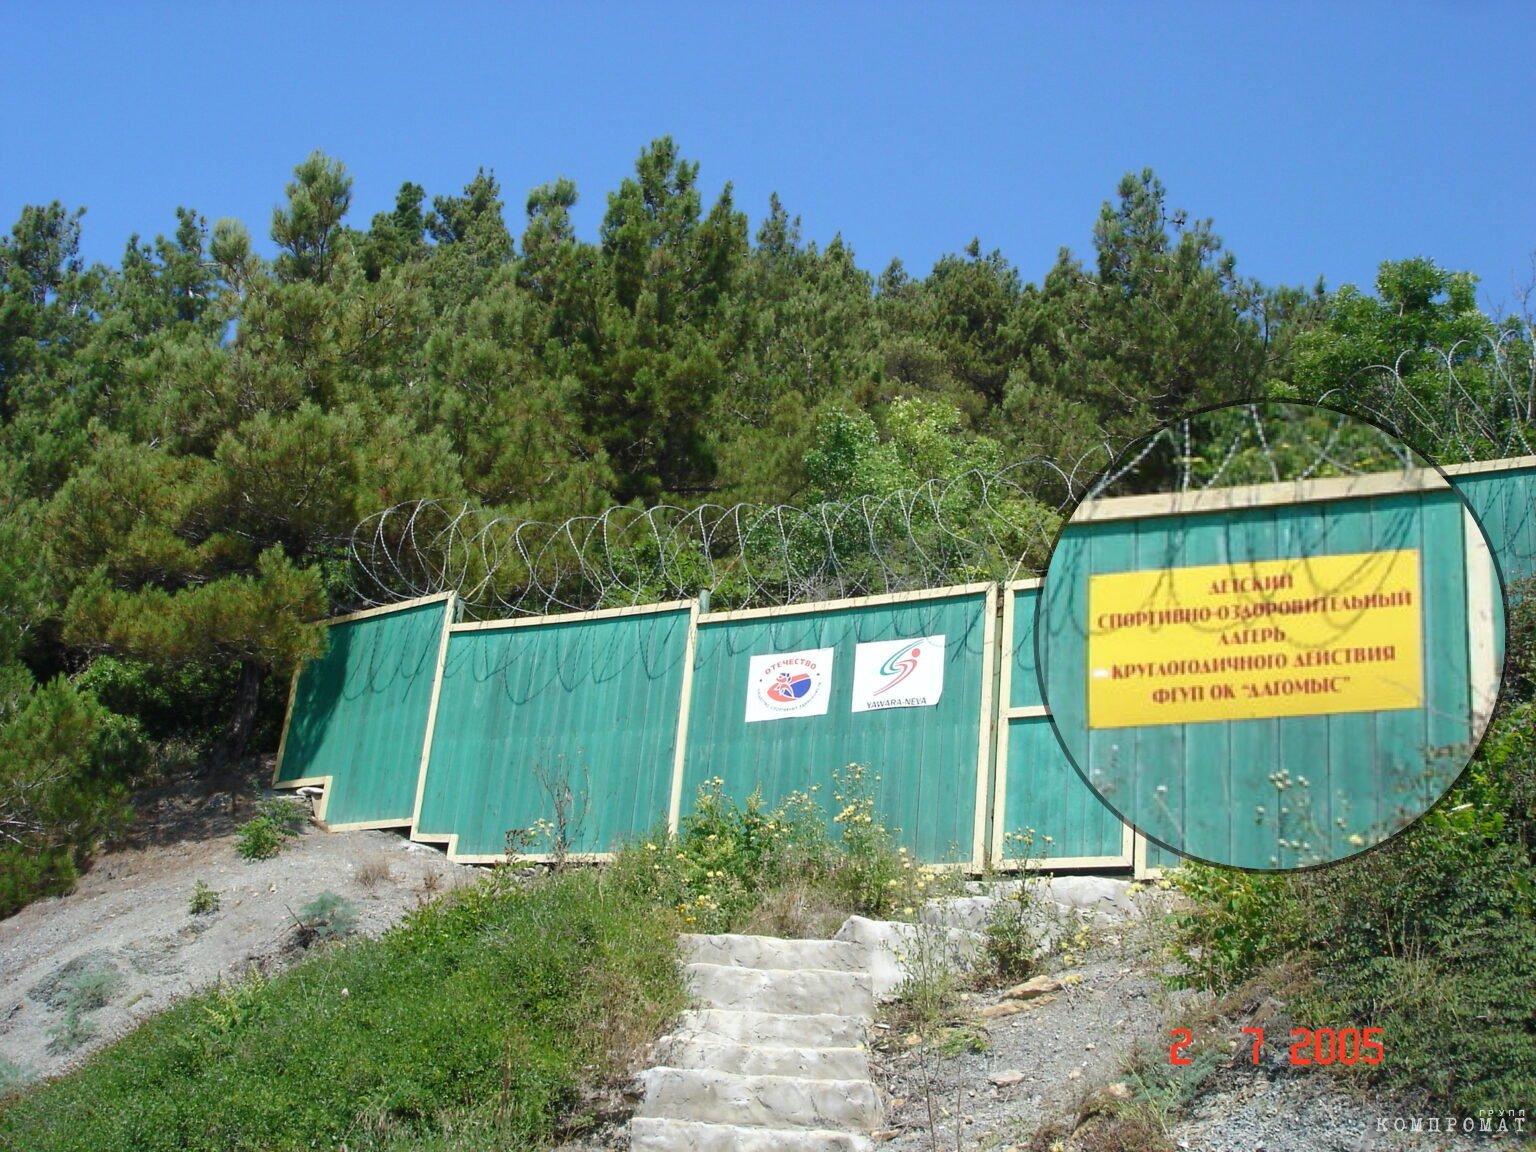 Табличка с логотипом клуба дзюдо «Явара-Нева» и табличка о детском лагере на изгороди дворца-долгостроя